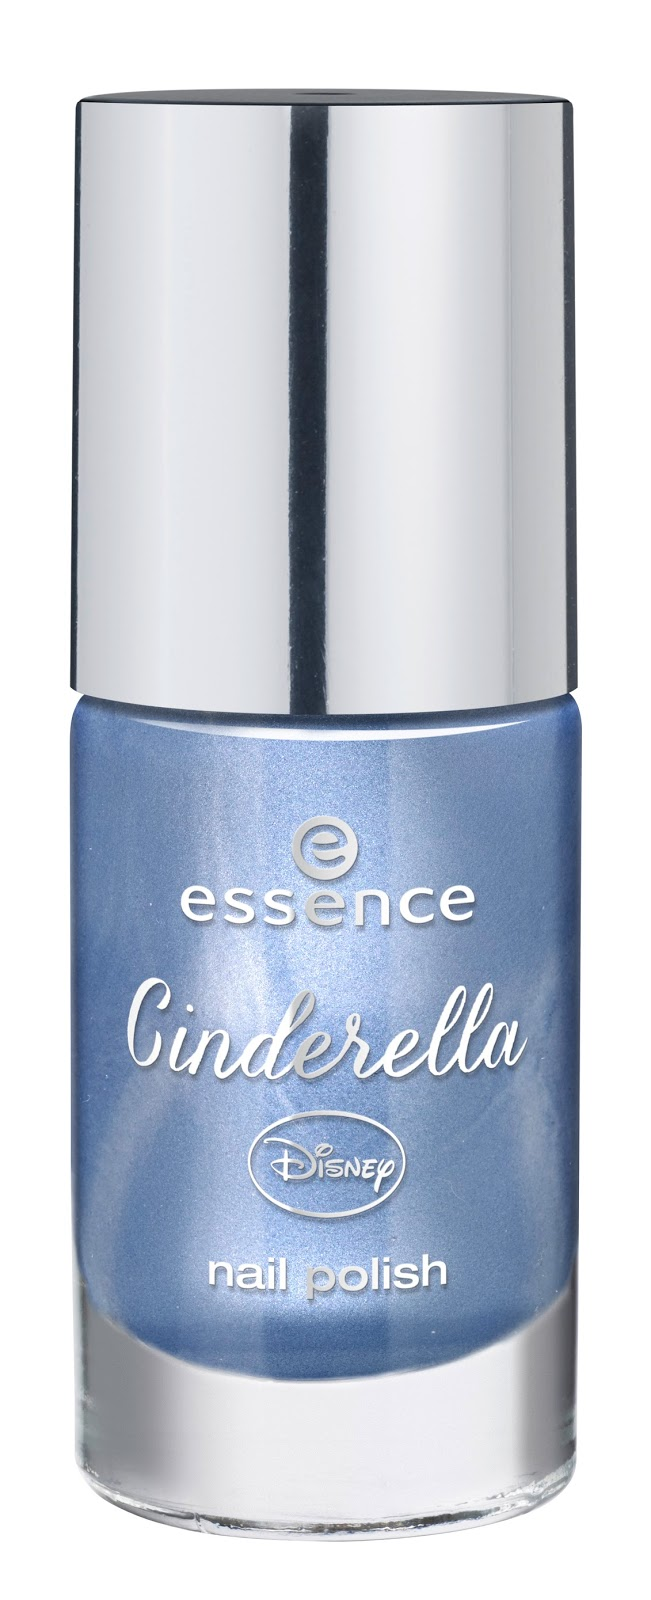 essence cinderella